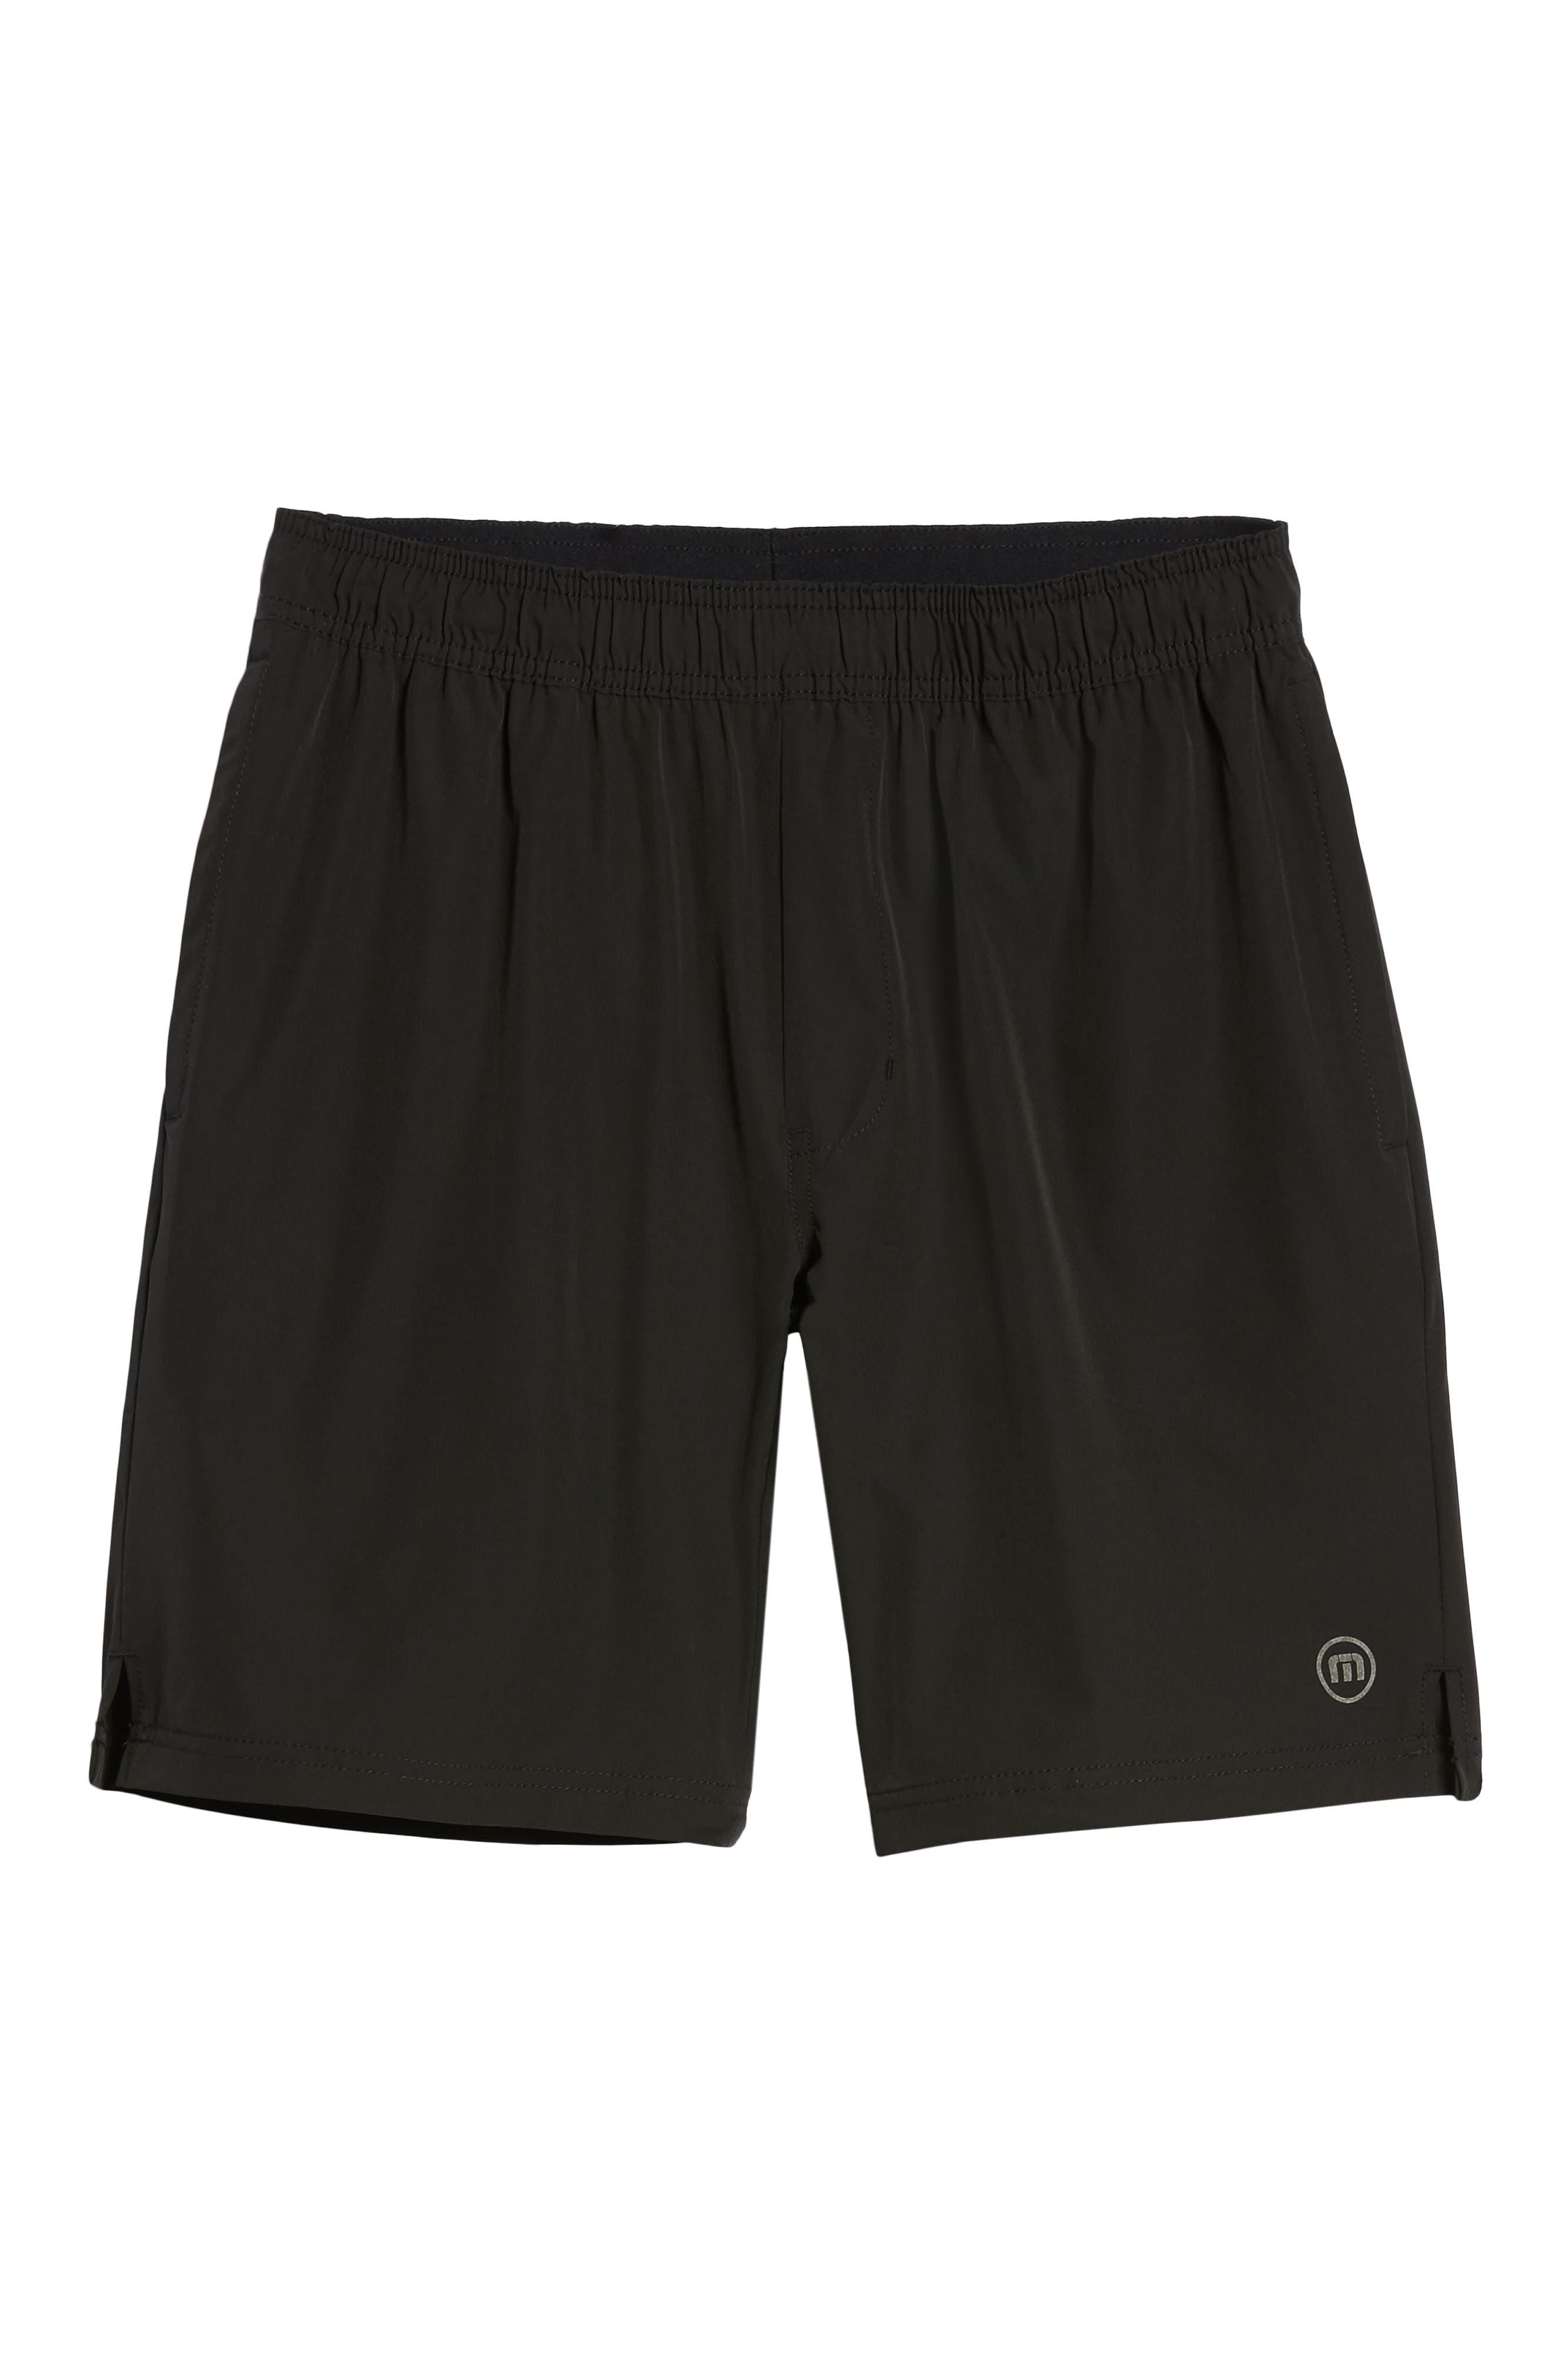 Deering Shorts,                             Alternate thumbnail 6, color,                             BLACK